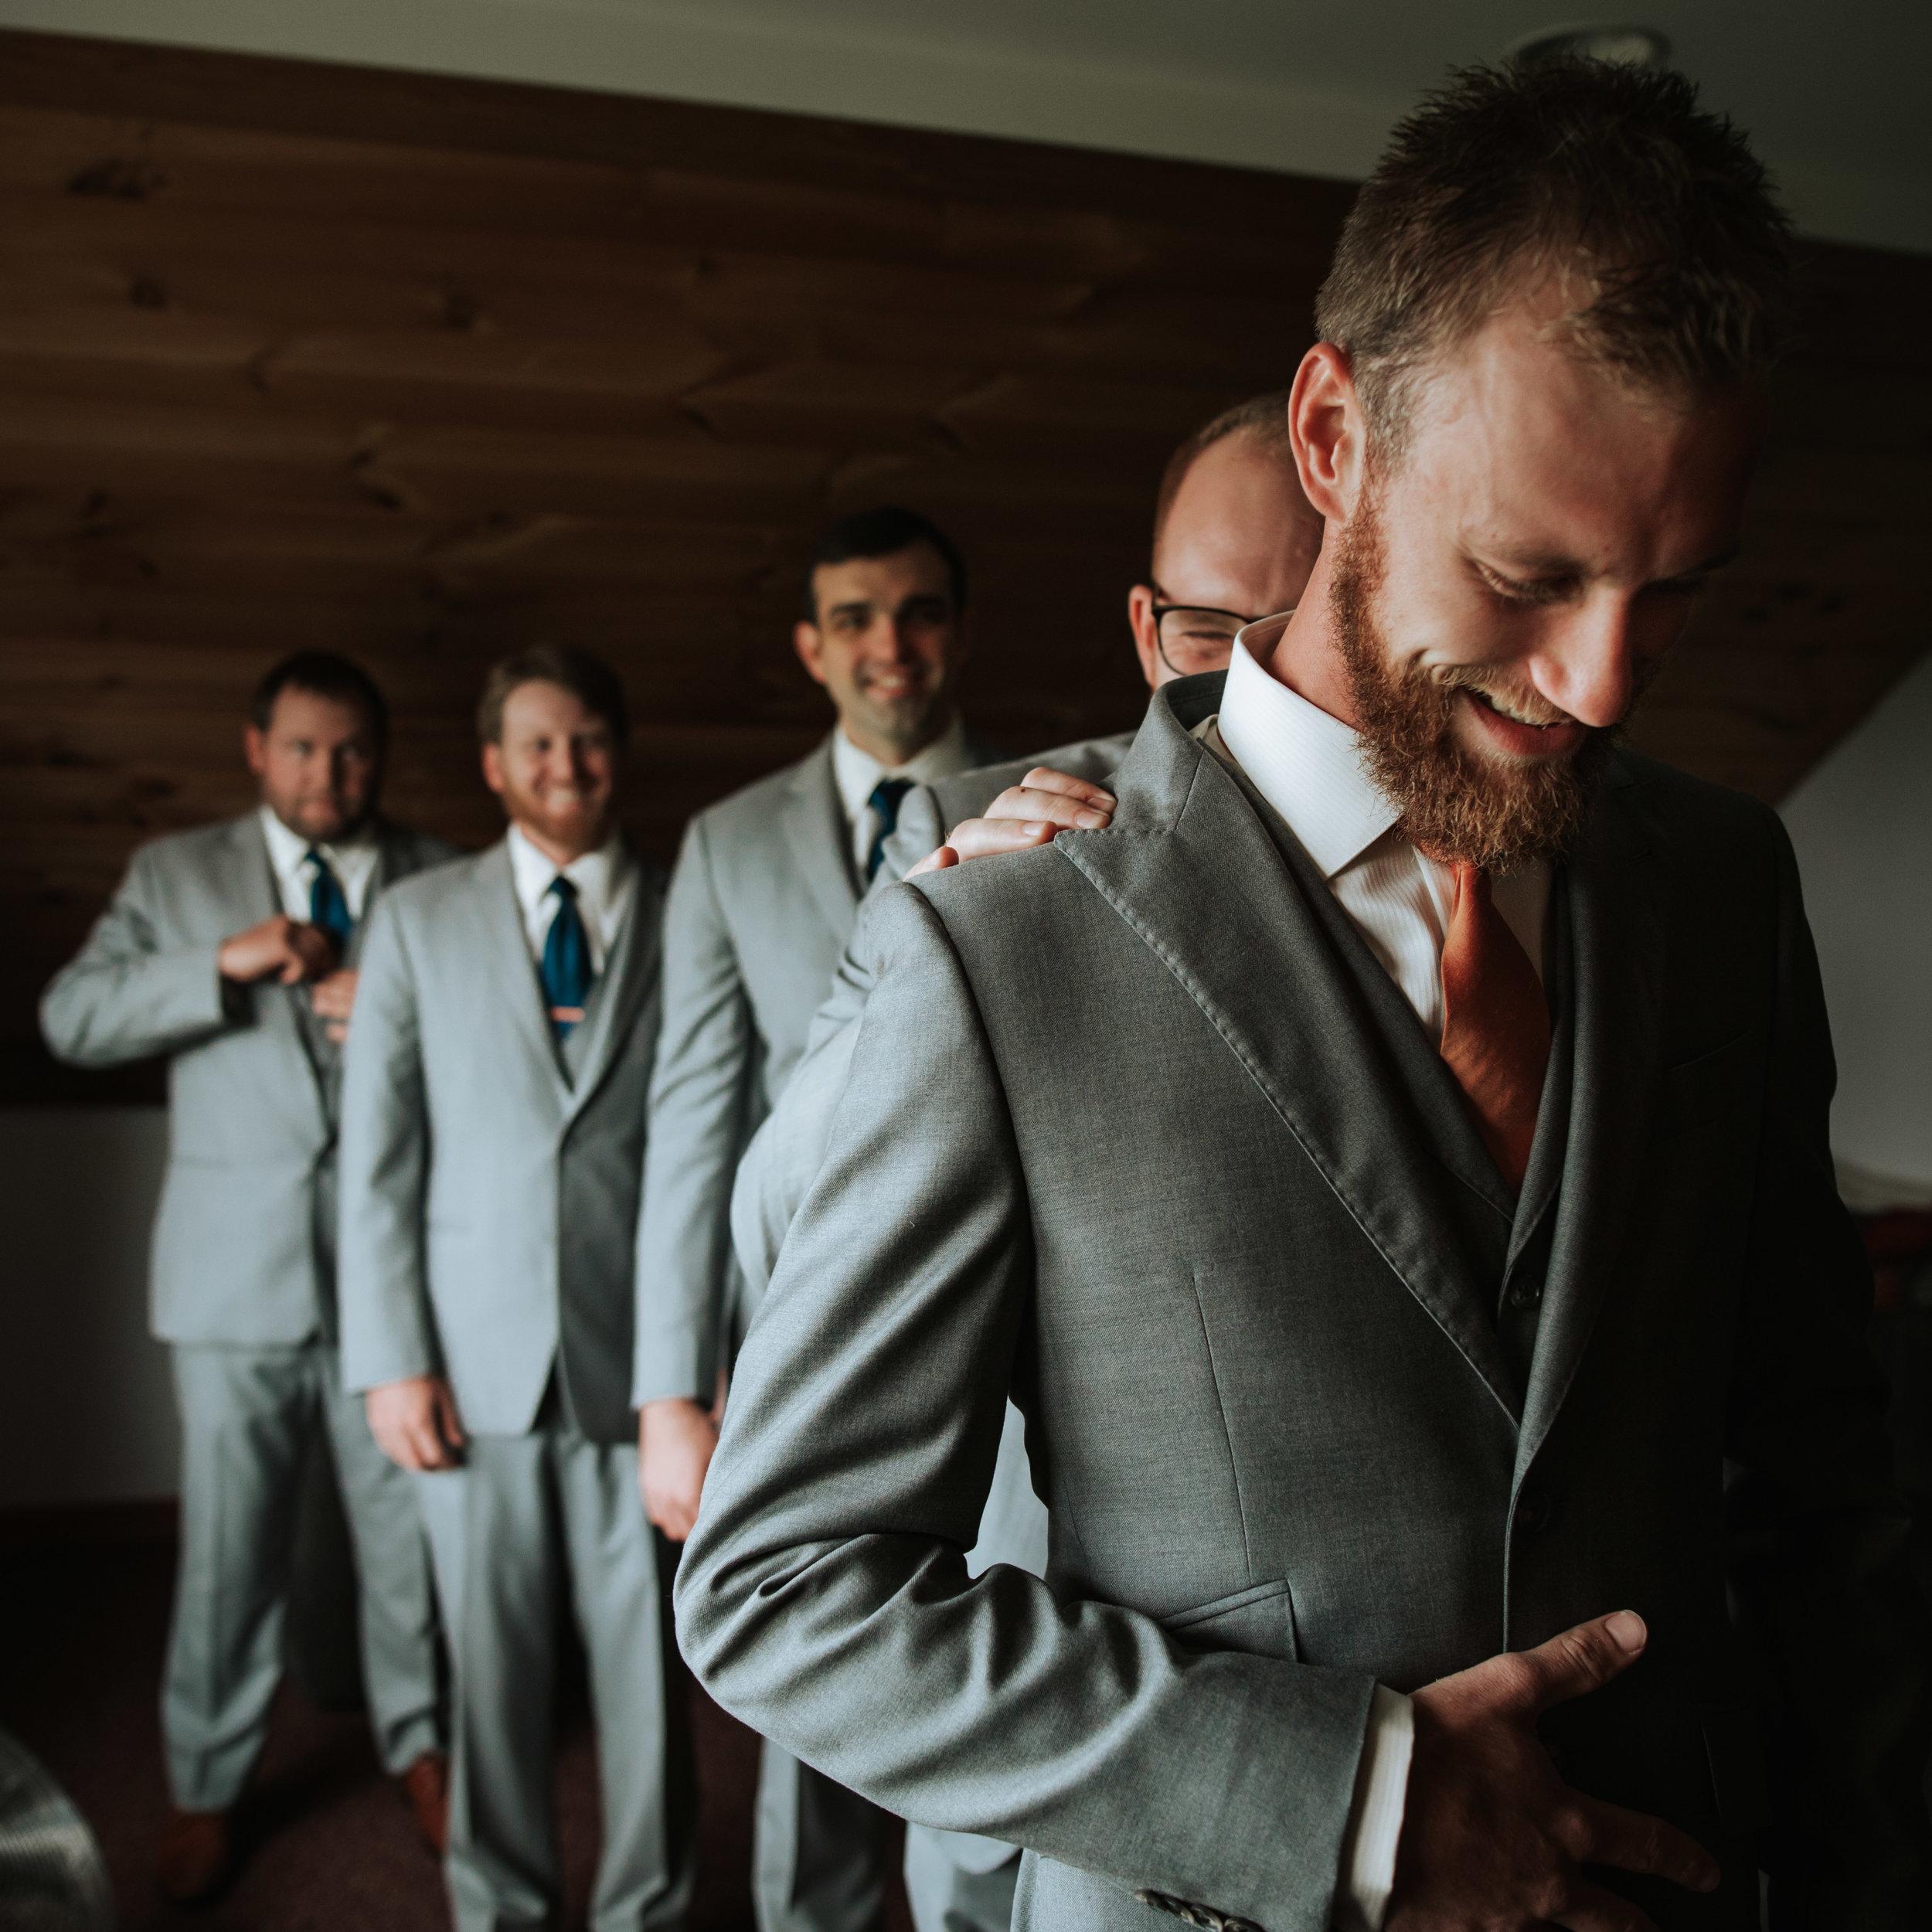 Vermont Wedding | Lorianna Weathers Photography-0179.jpg